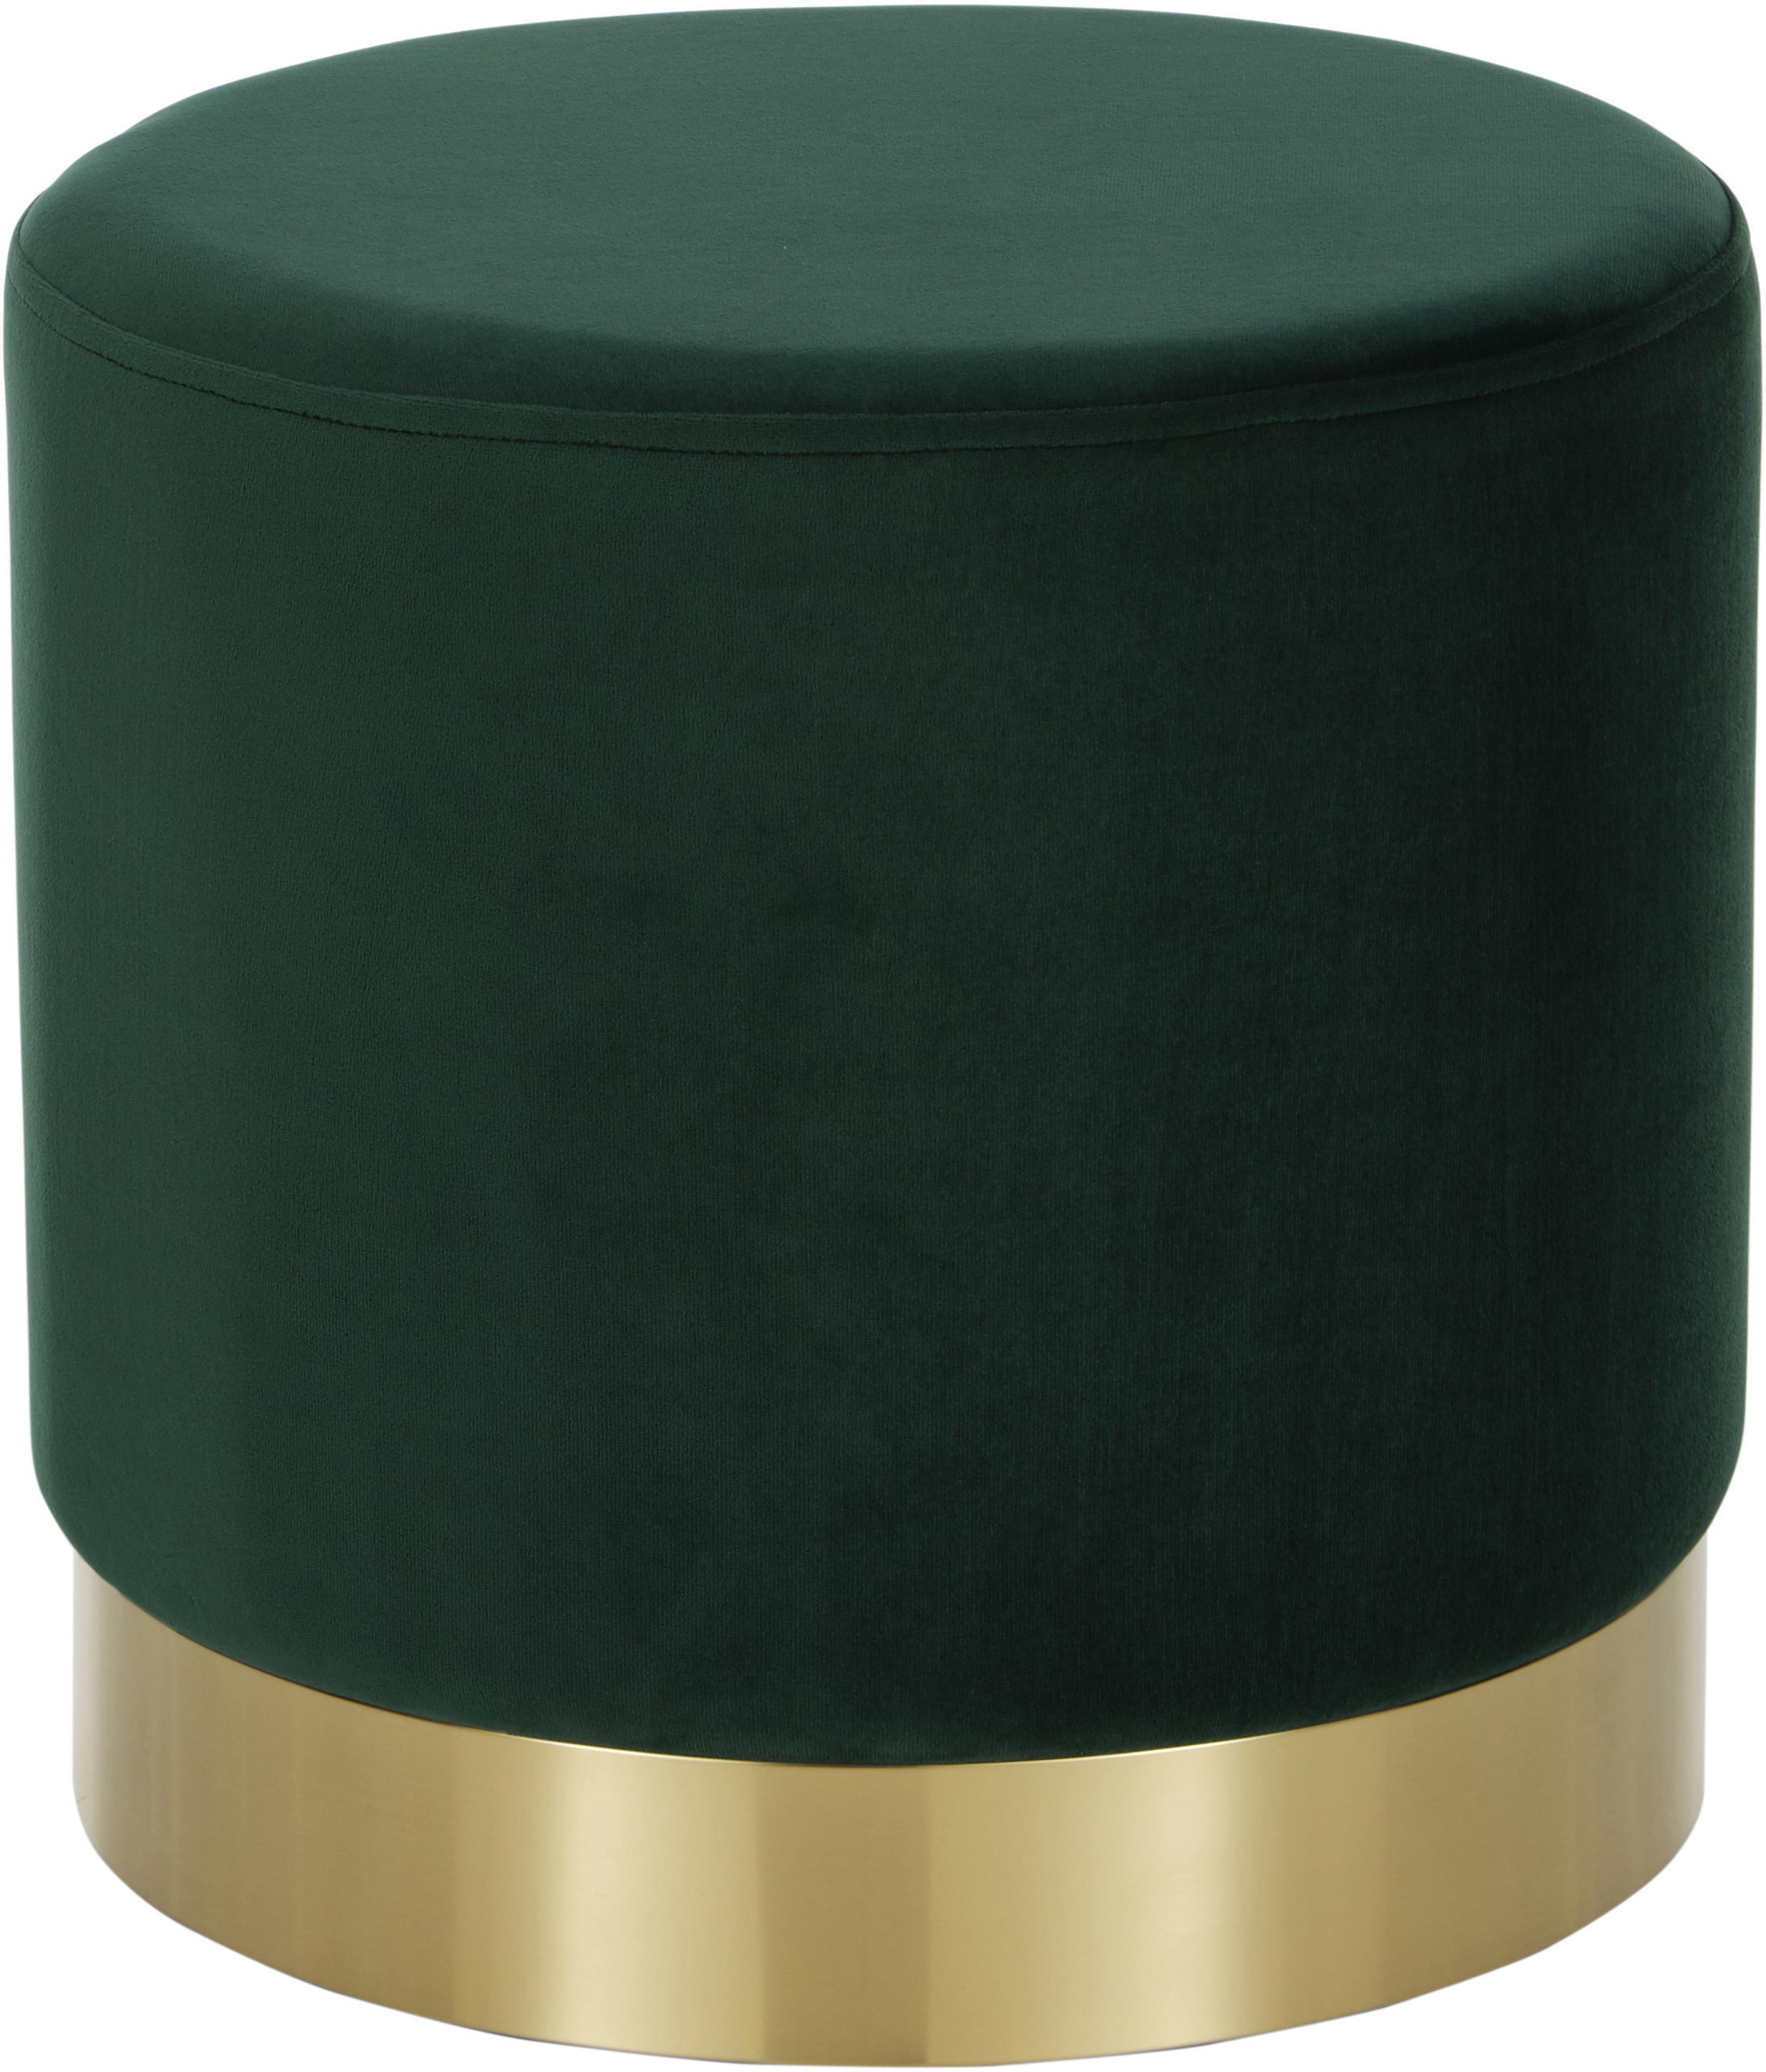 Samt-Hocker Orchid, Bezug: Samt (Polyester) 25.000 S, Rahmen: Sperrholz, Bezug: Hellgrün. Fuß: Goldfarben, ∅ 38 x H 38 cm